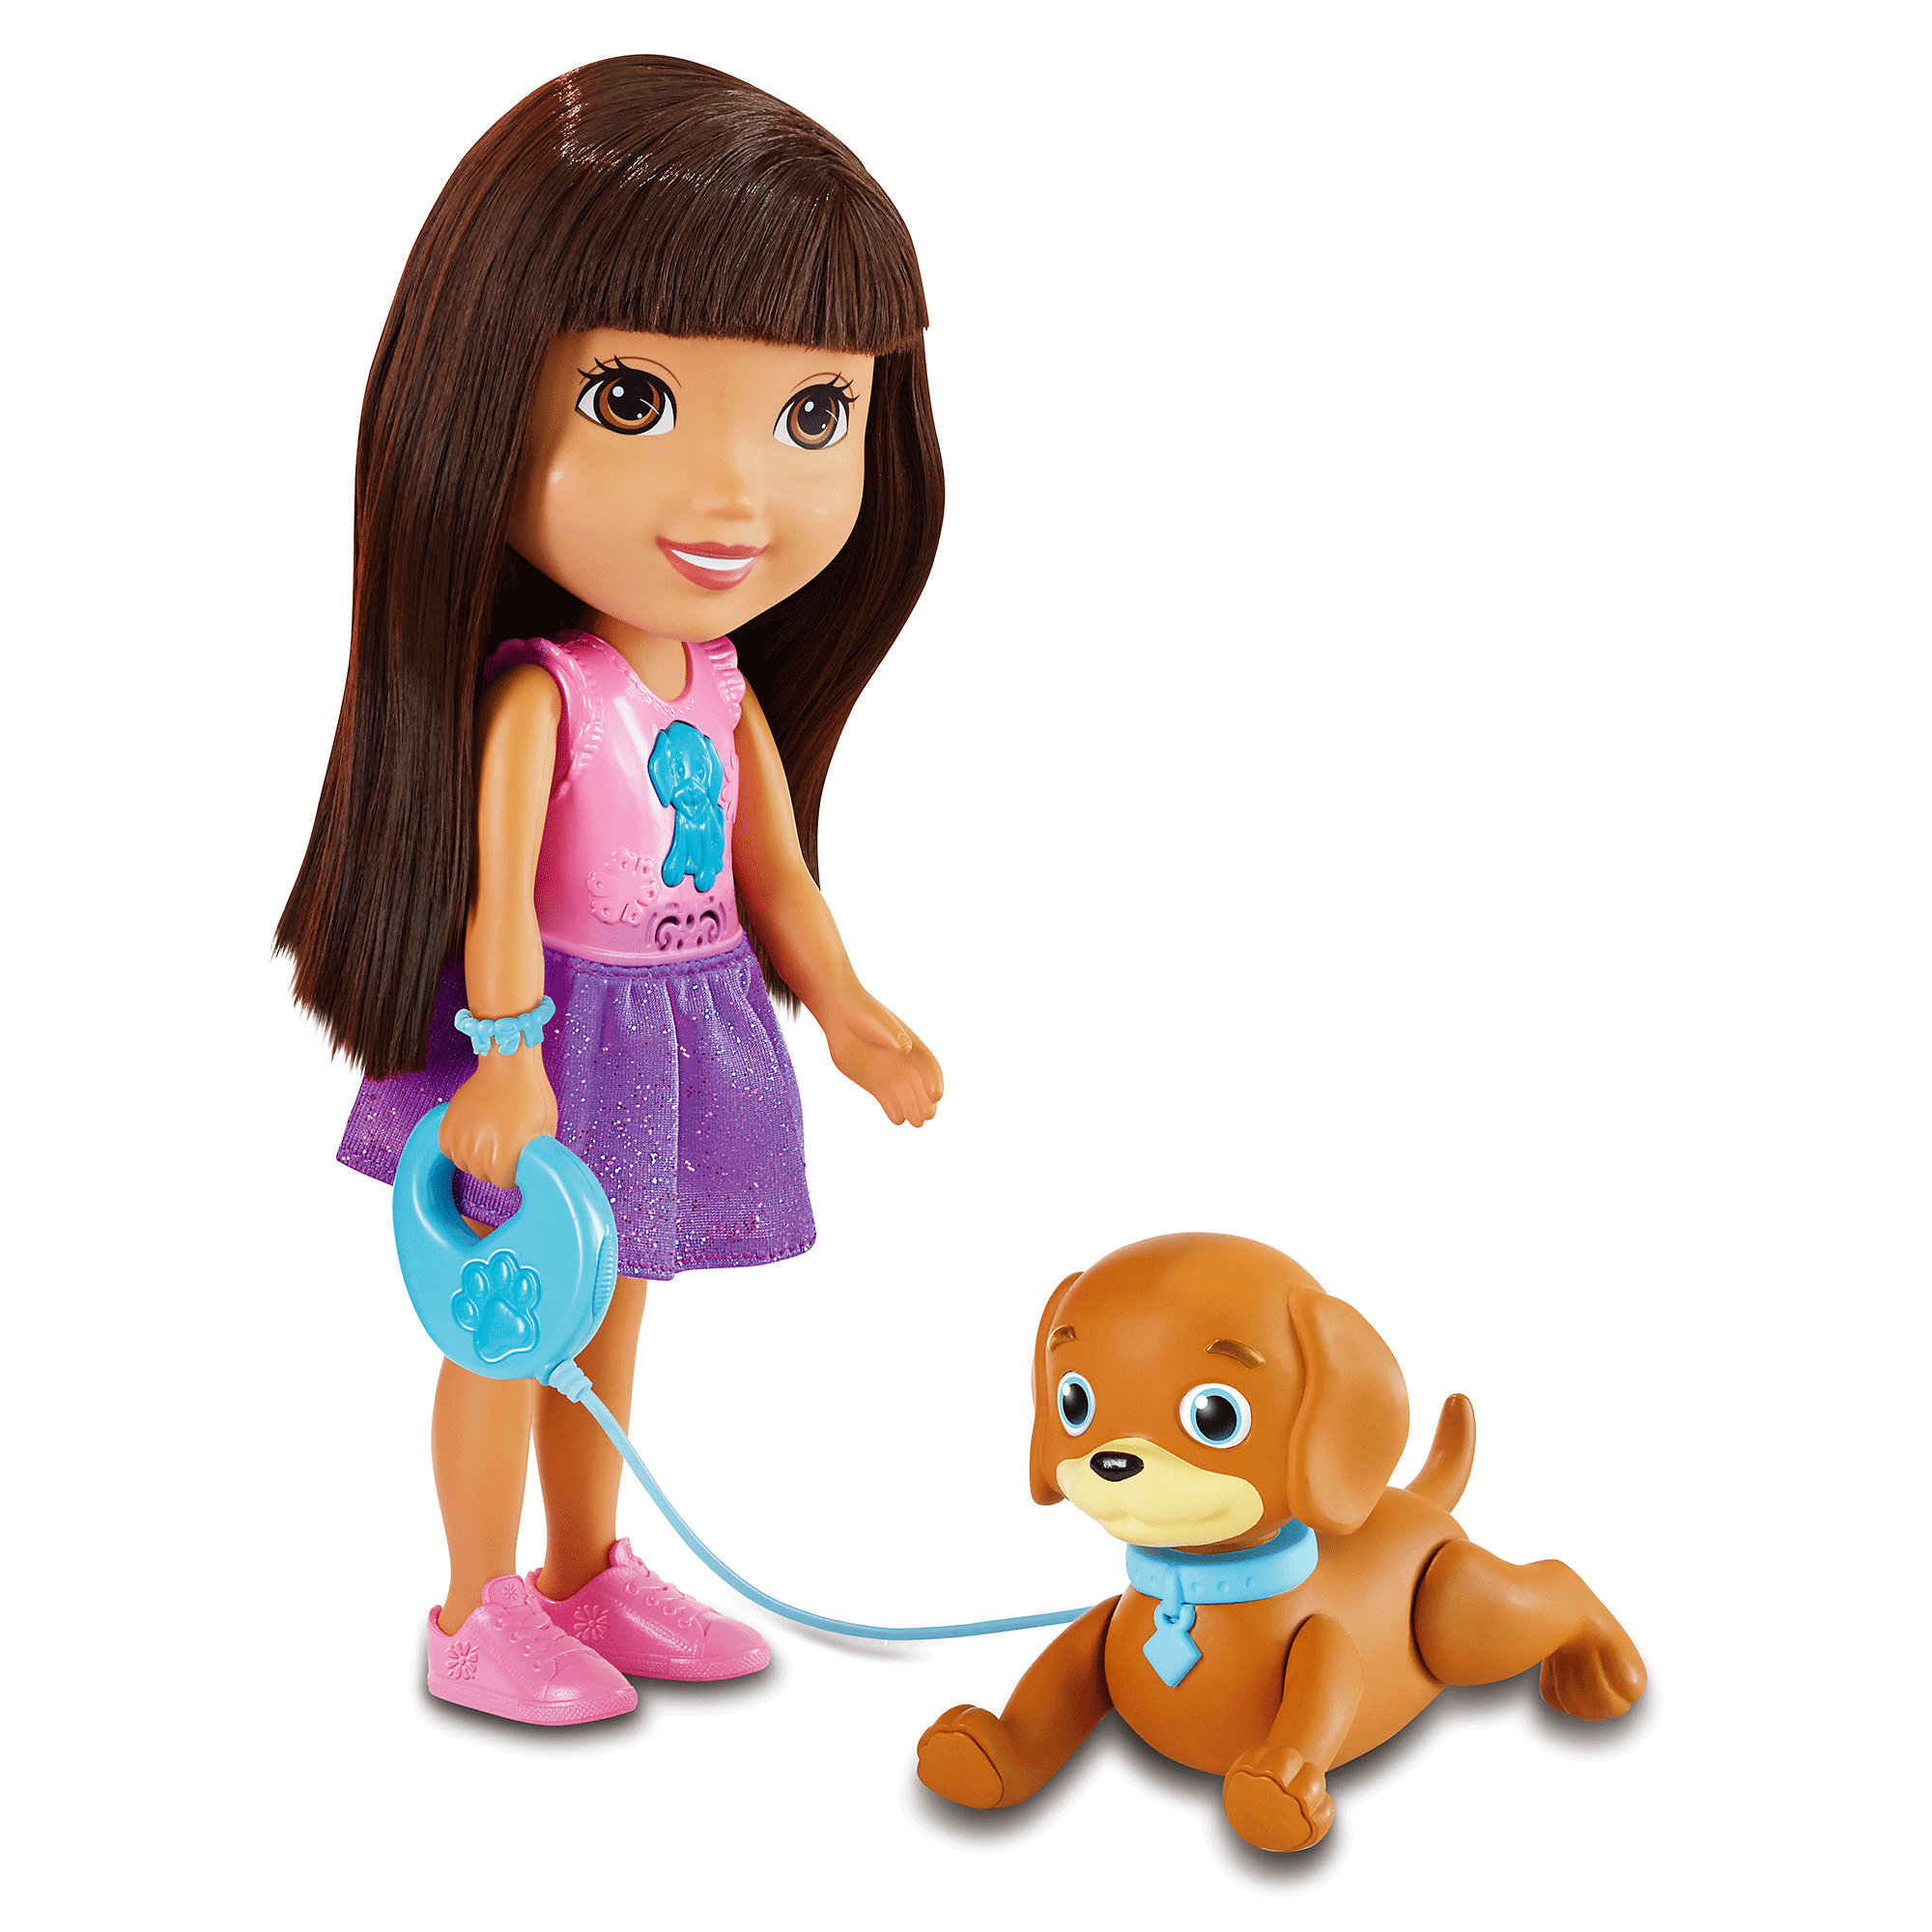 Sensational Nickelodeon Dora And Friends Train Play Dora And Perrito Evergreenethics Interior Chair Design Evergreenethicsorg